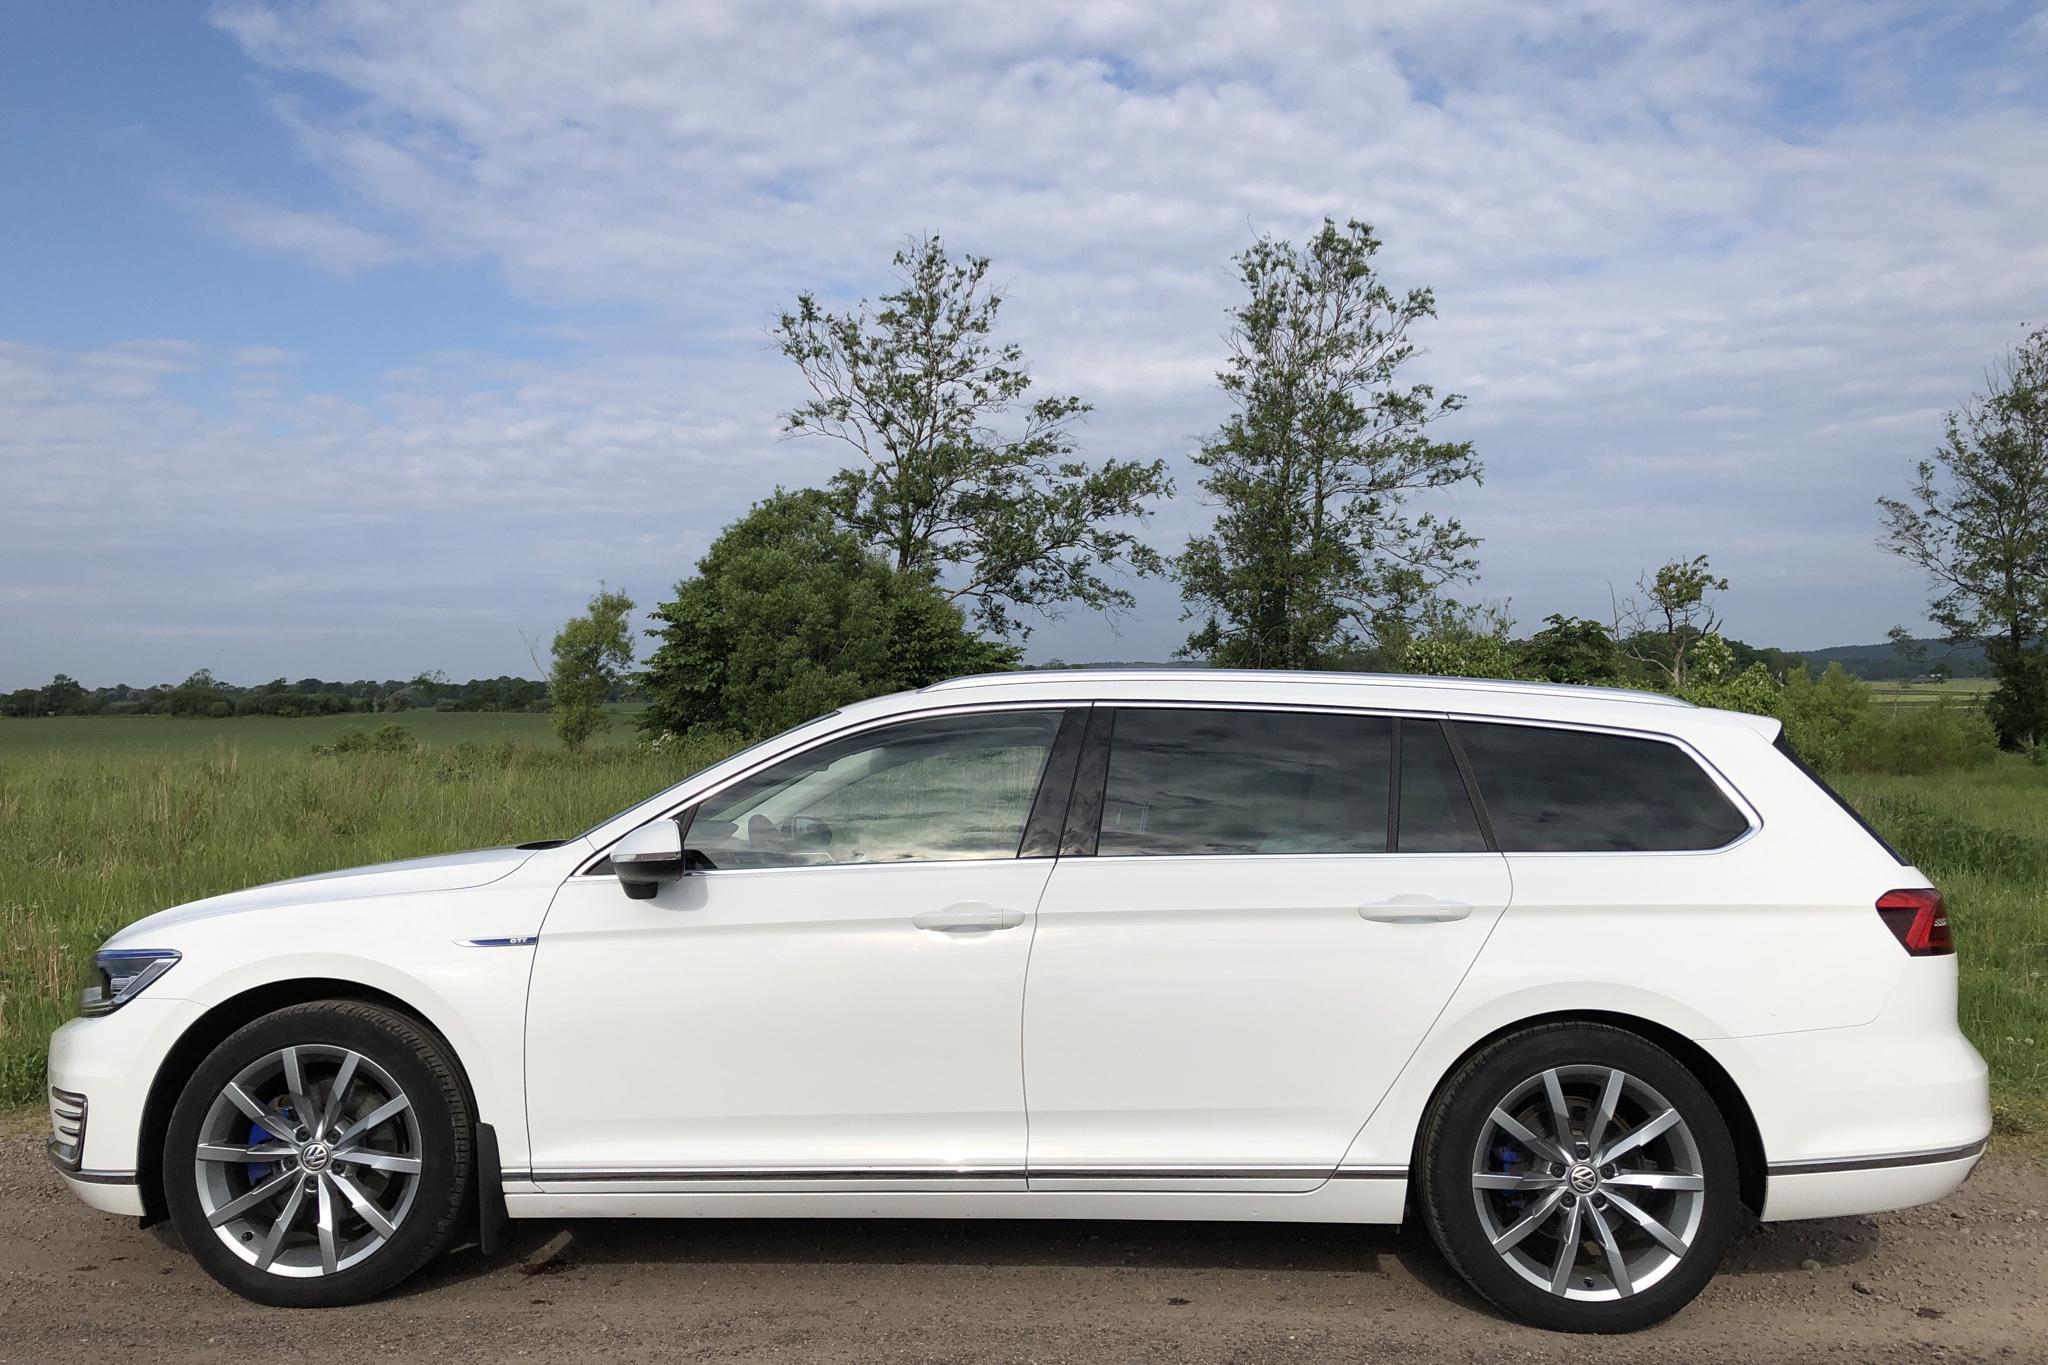 VW Passat 1.4 Plug-in-Hybrid Sportscombi (218hk) - 4 360 mil - Automat - vit - 2018